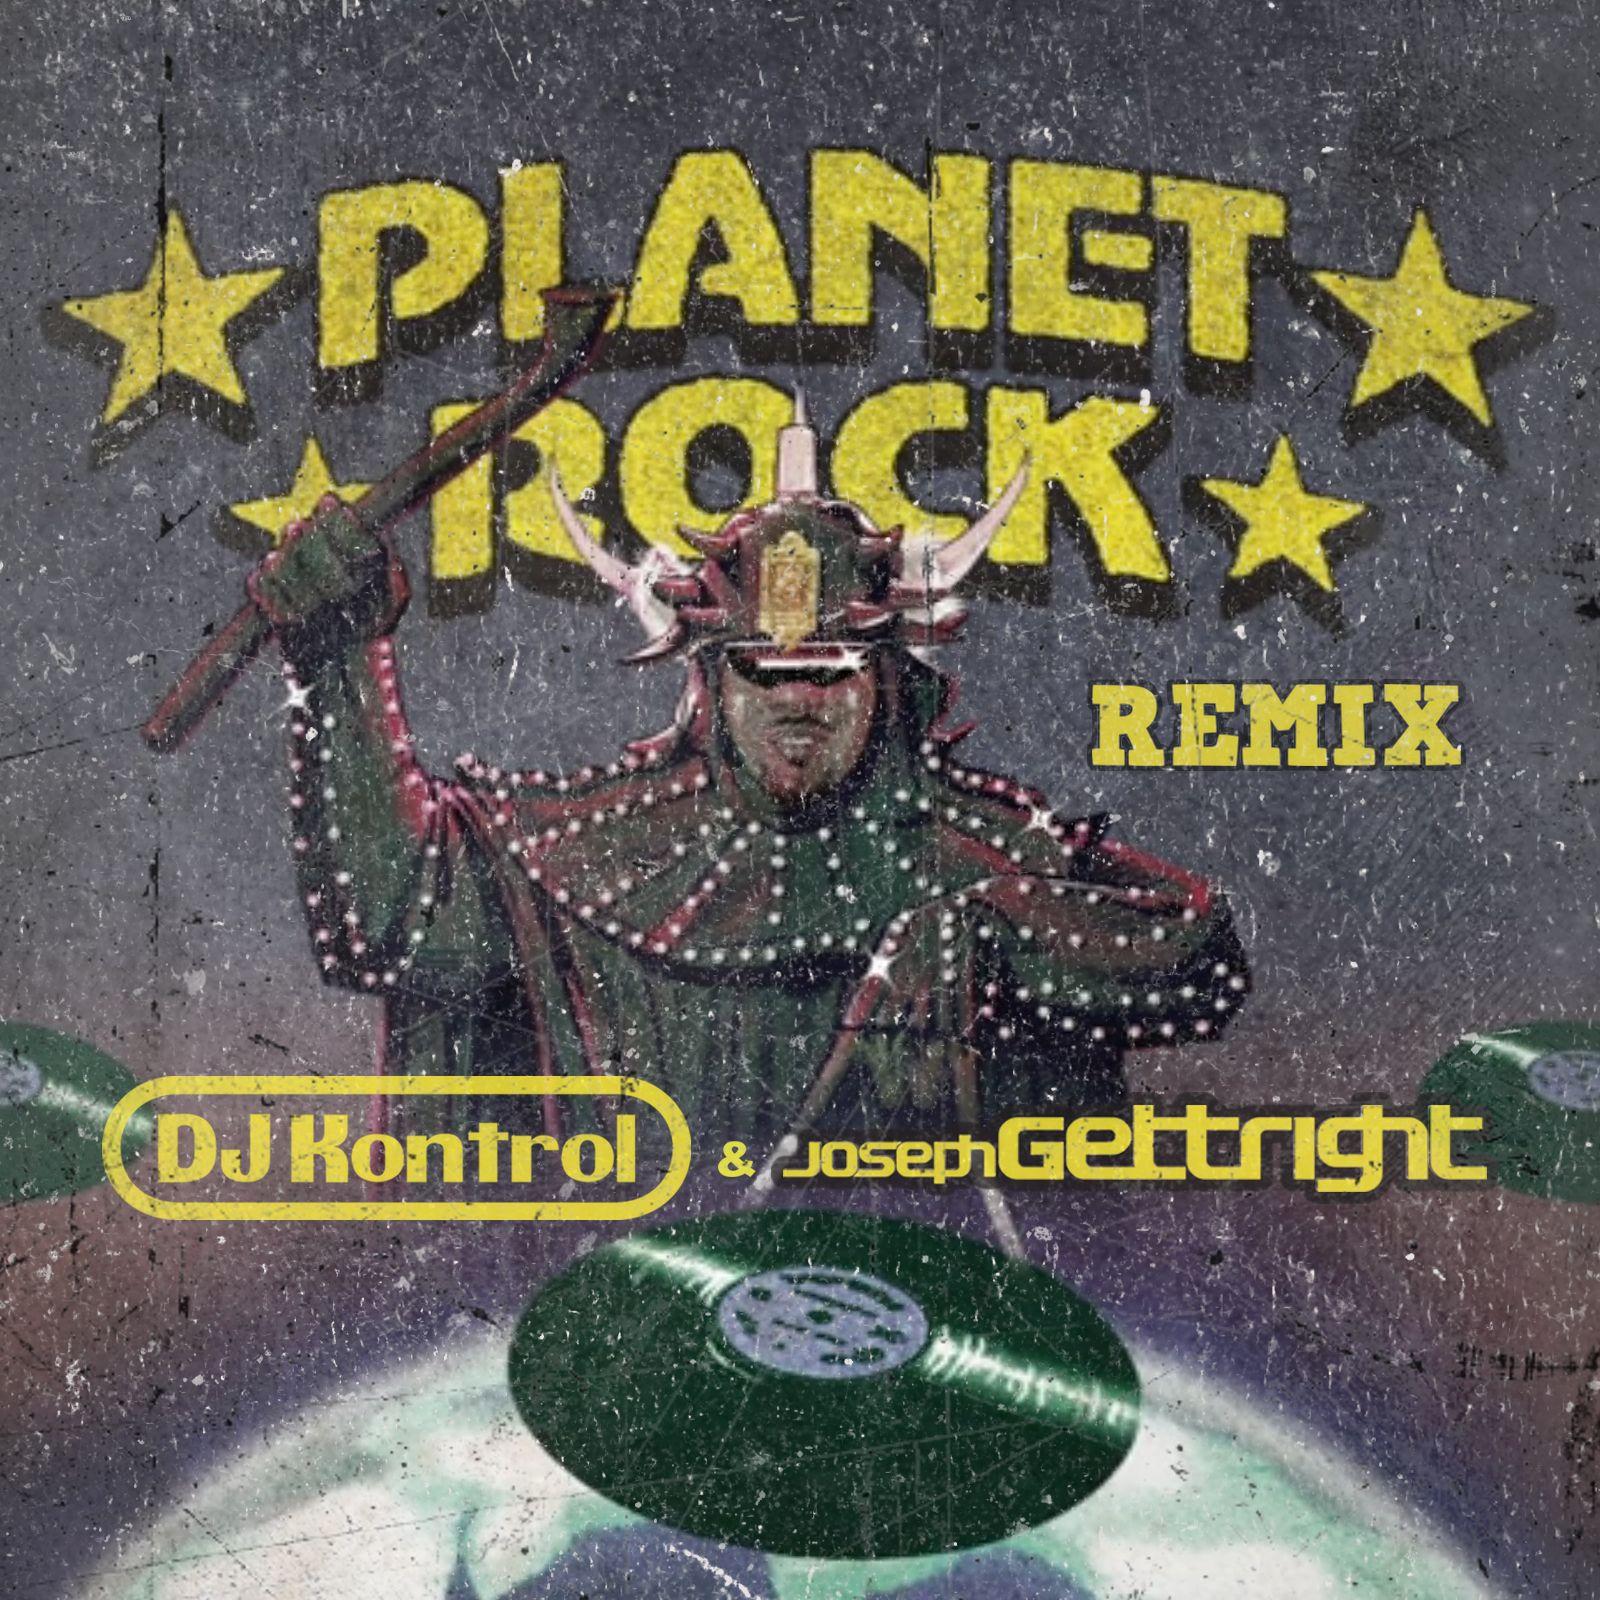 Planet Rock (DJ Kontrol & Gettright Remix) by Afrika Bambaataa & The